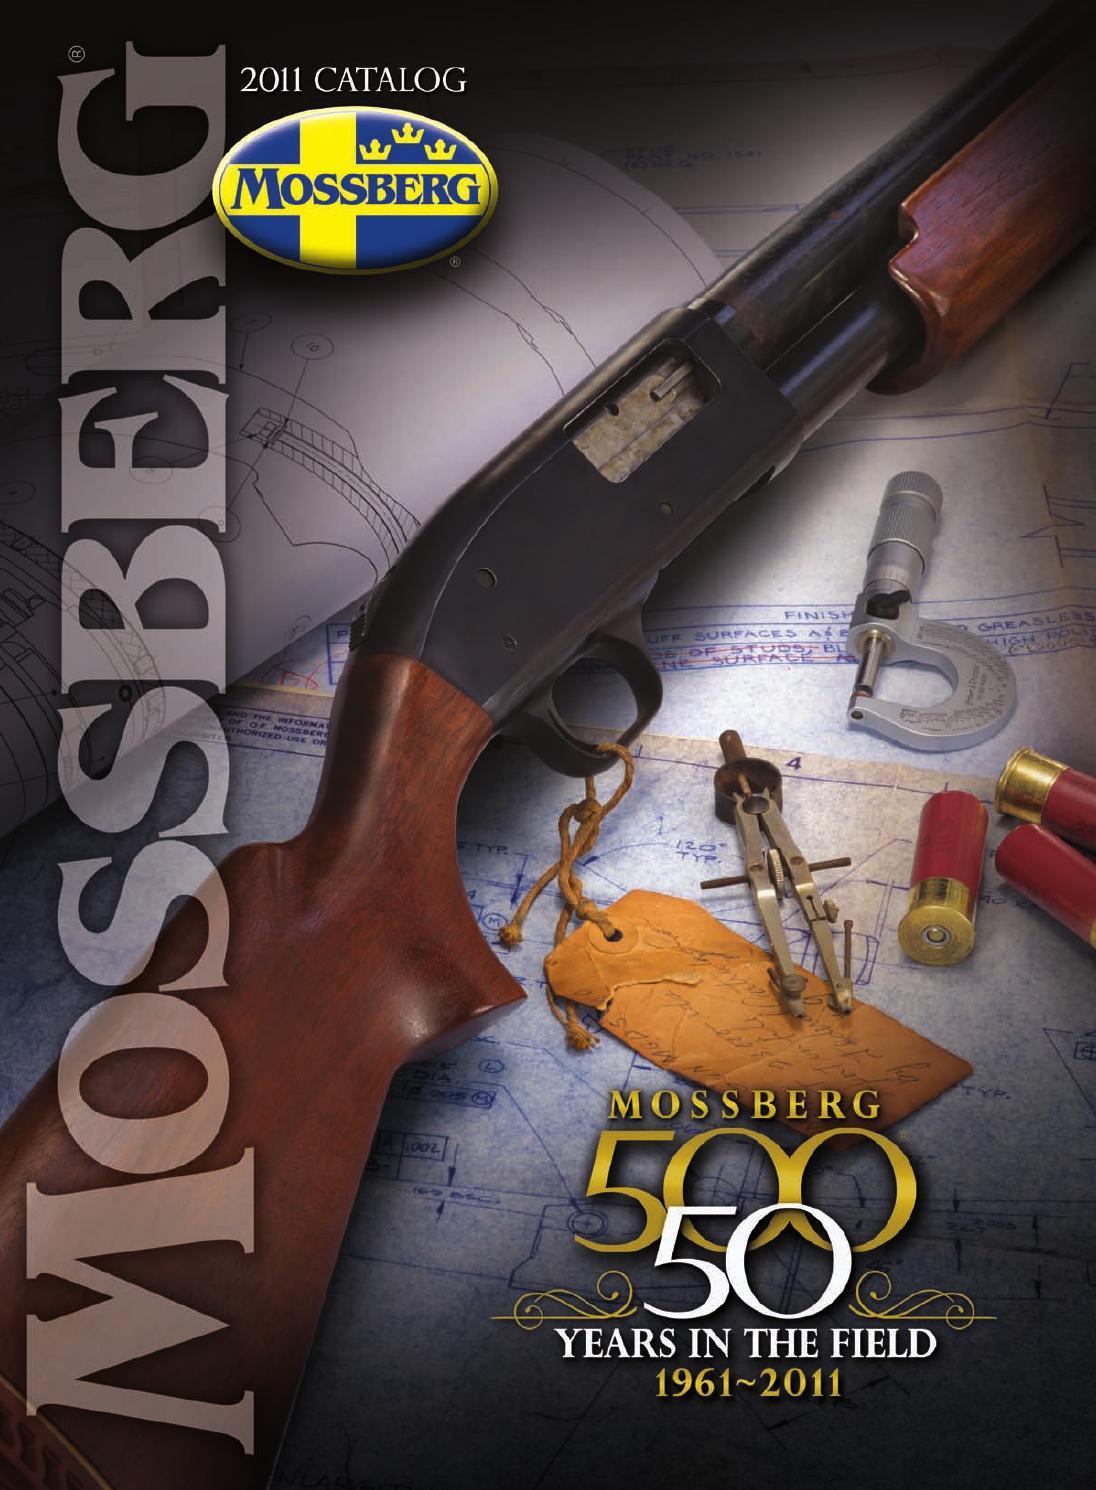 2011 mossberg catalog by Bignami S p A  - issuu